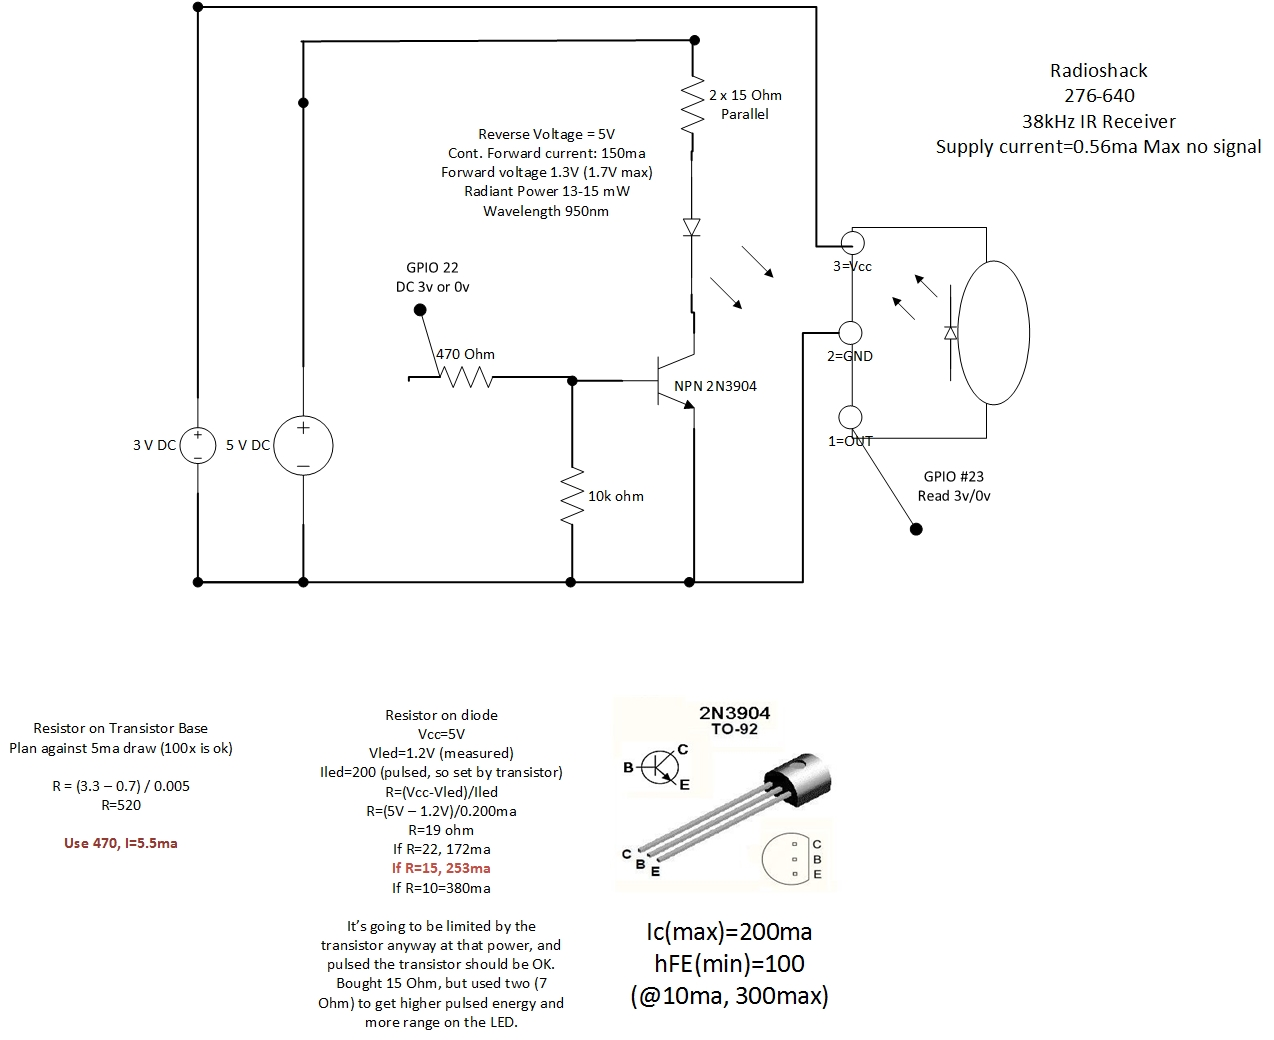 Raspberry Pi LED+ Remote Project – Linwood Ferguson on banana pi schematic, scr motor control schematic, acorn archimedes, zx spectrum, gpio pinout schematic, single-board computer, computer schematic, rs232 isolator schematic, bluetooth schematic, atmega328 schematic, ipad schematic, raspberry pi foundation, beagle board, xbox 360 schematic, lcd schematic, acorn computers, scr dimmer schematic, orange pi schematic, bbc micro, usb schematic,